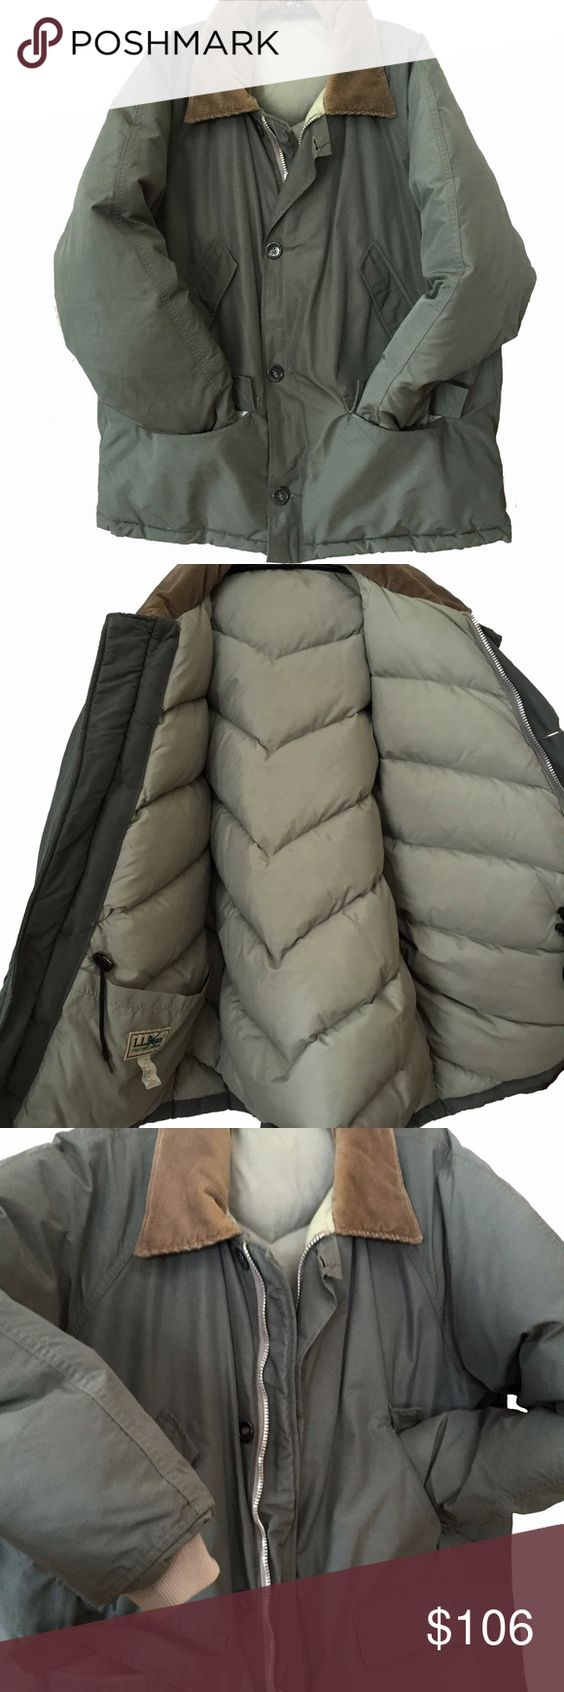 NEW LLBean 100% goose down jacket parka coat WOW